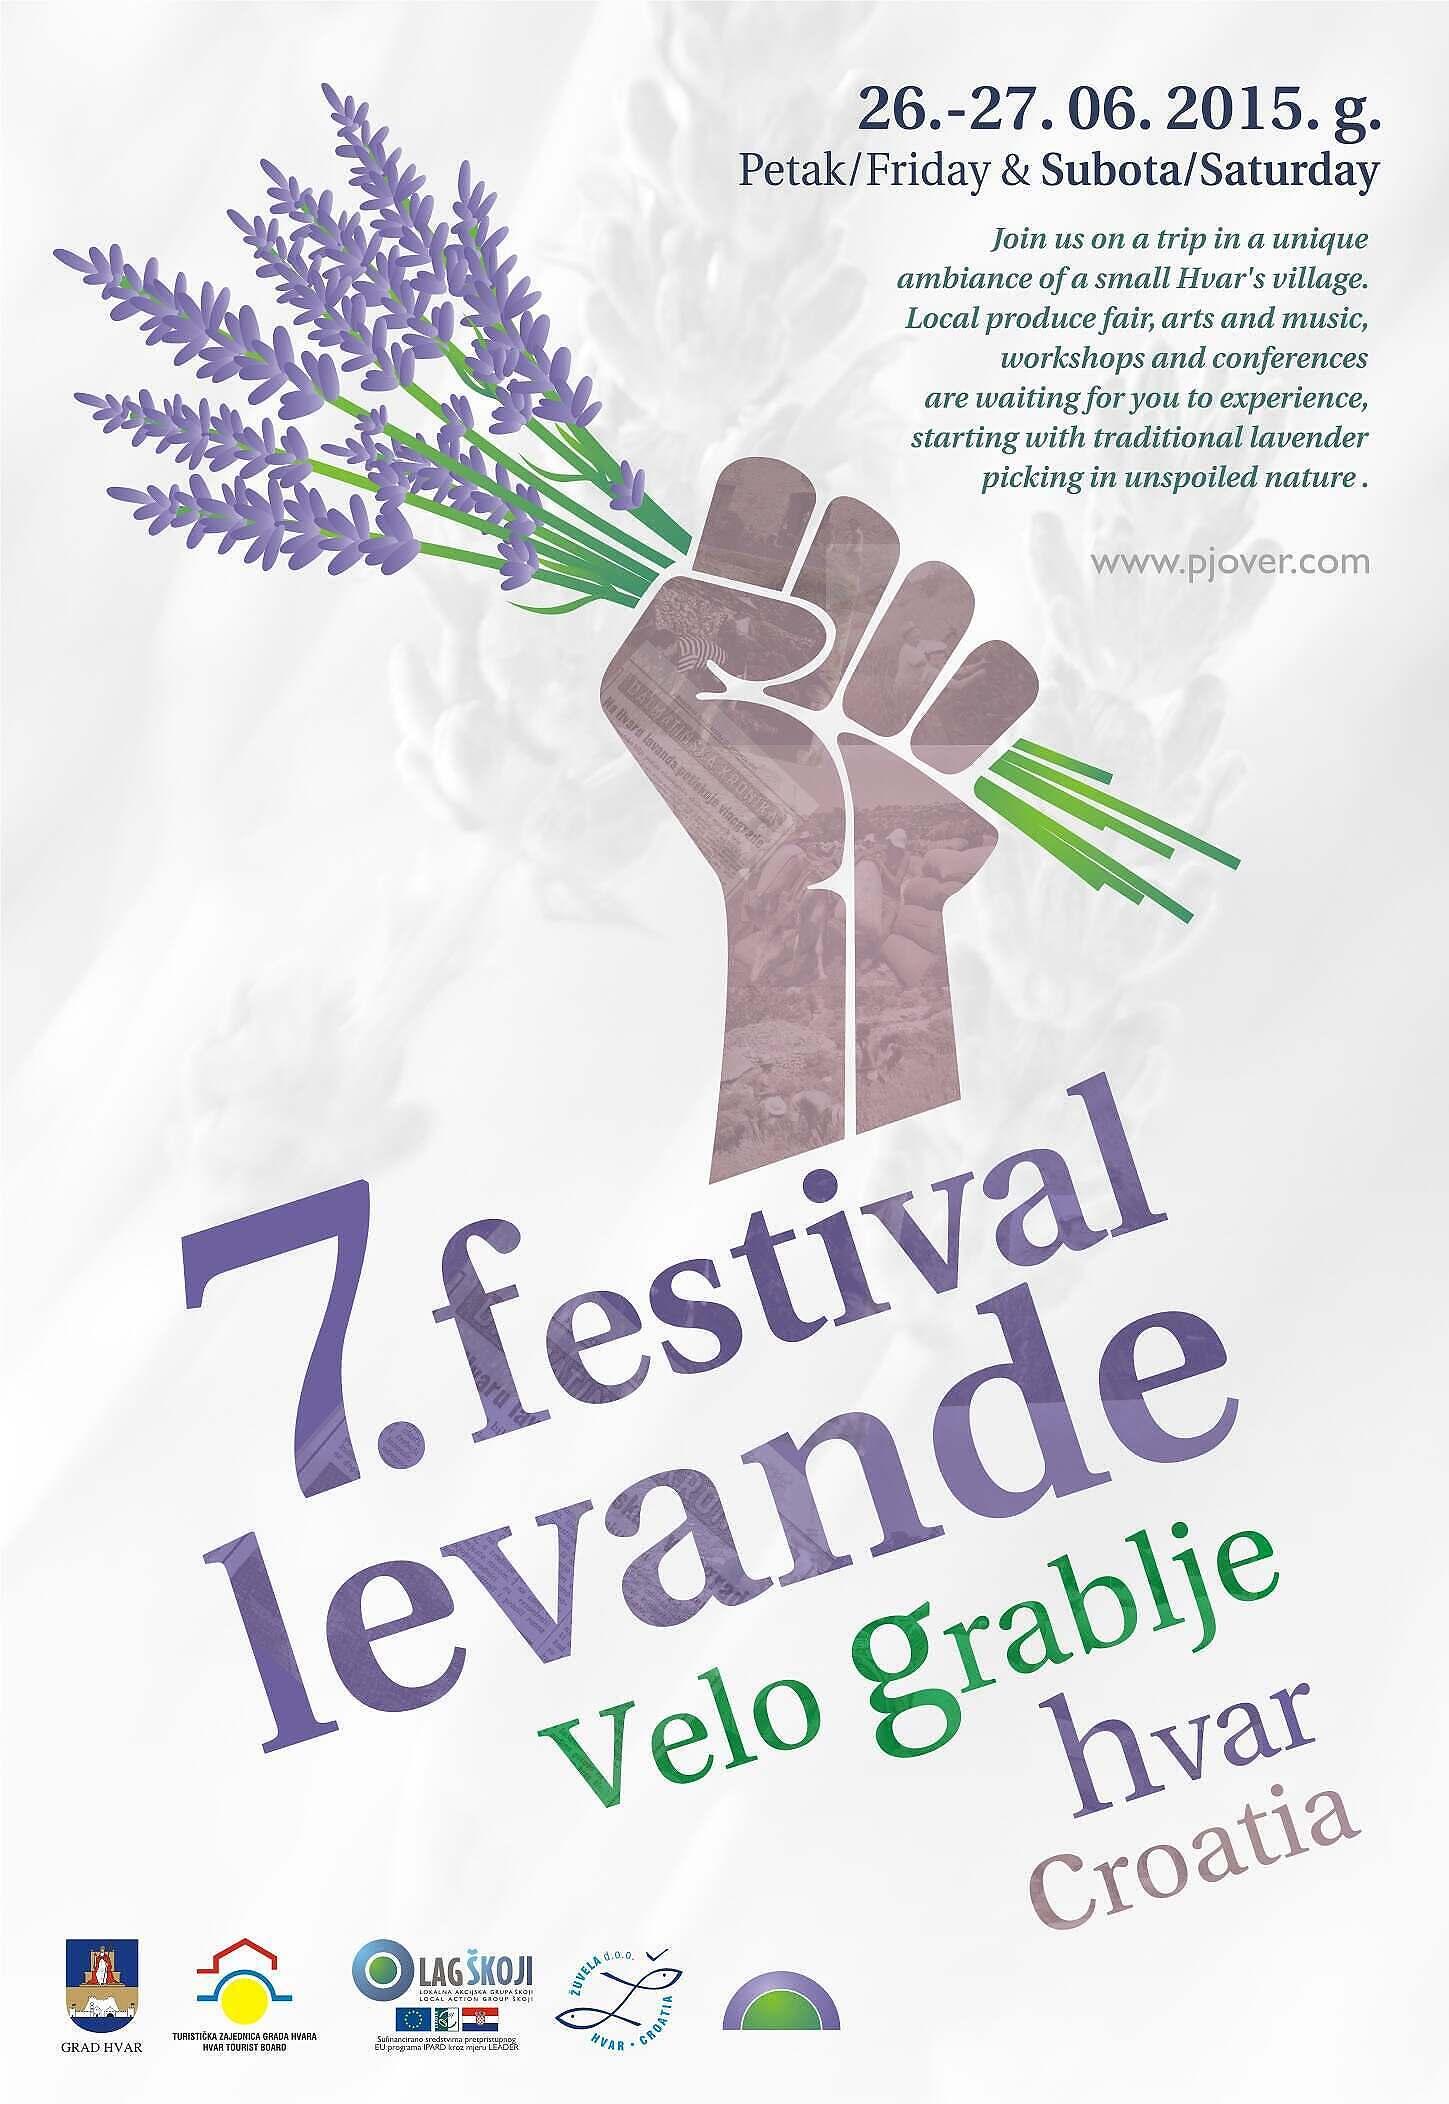 7 fest levande plakat